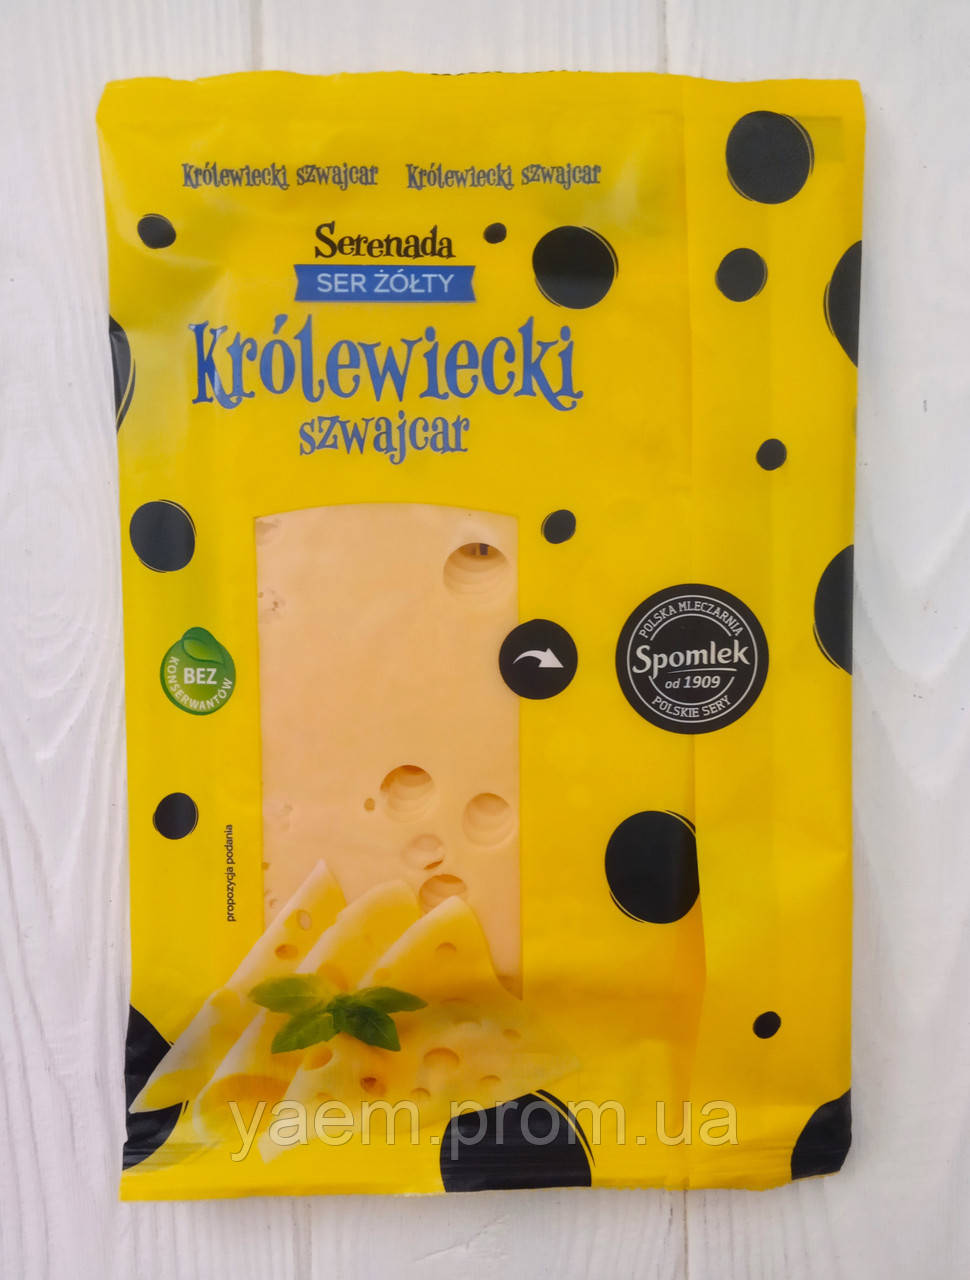 Сыр слайсами нарезка Serenada Krolewiecki szwajcar 135g (Польша)